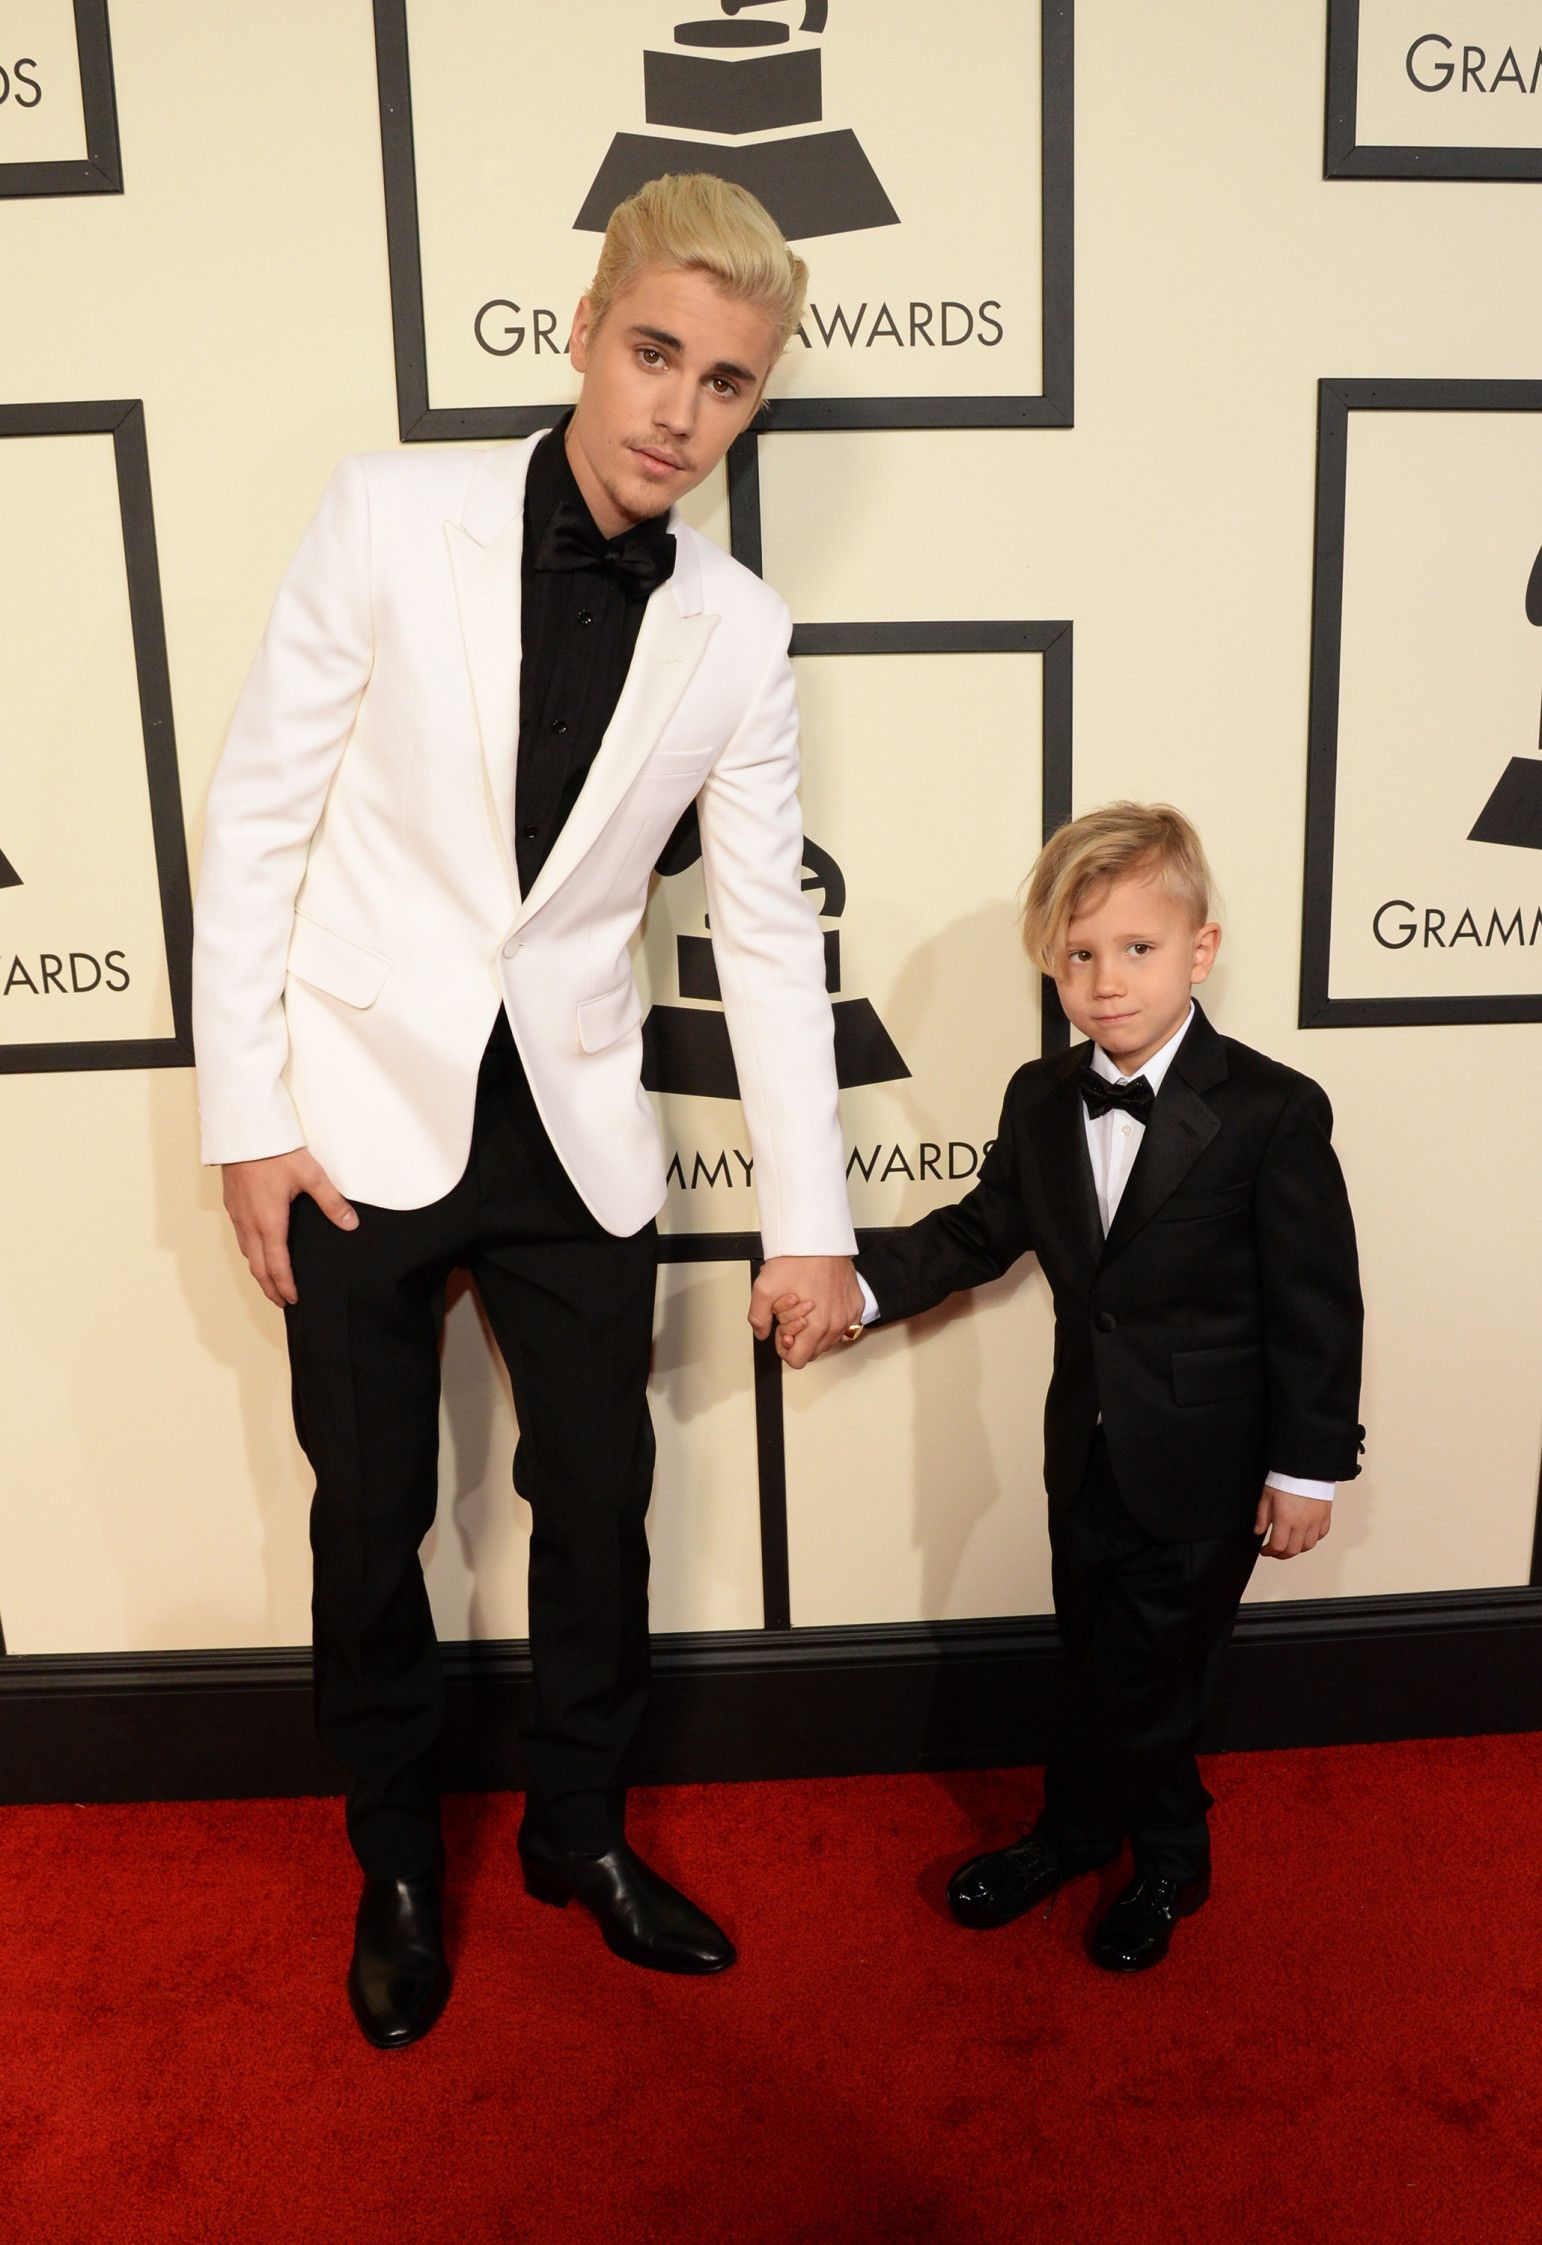 Grammy Awards 2016: Best Dressed on the Red Carpet ...